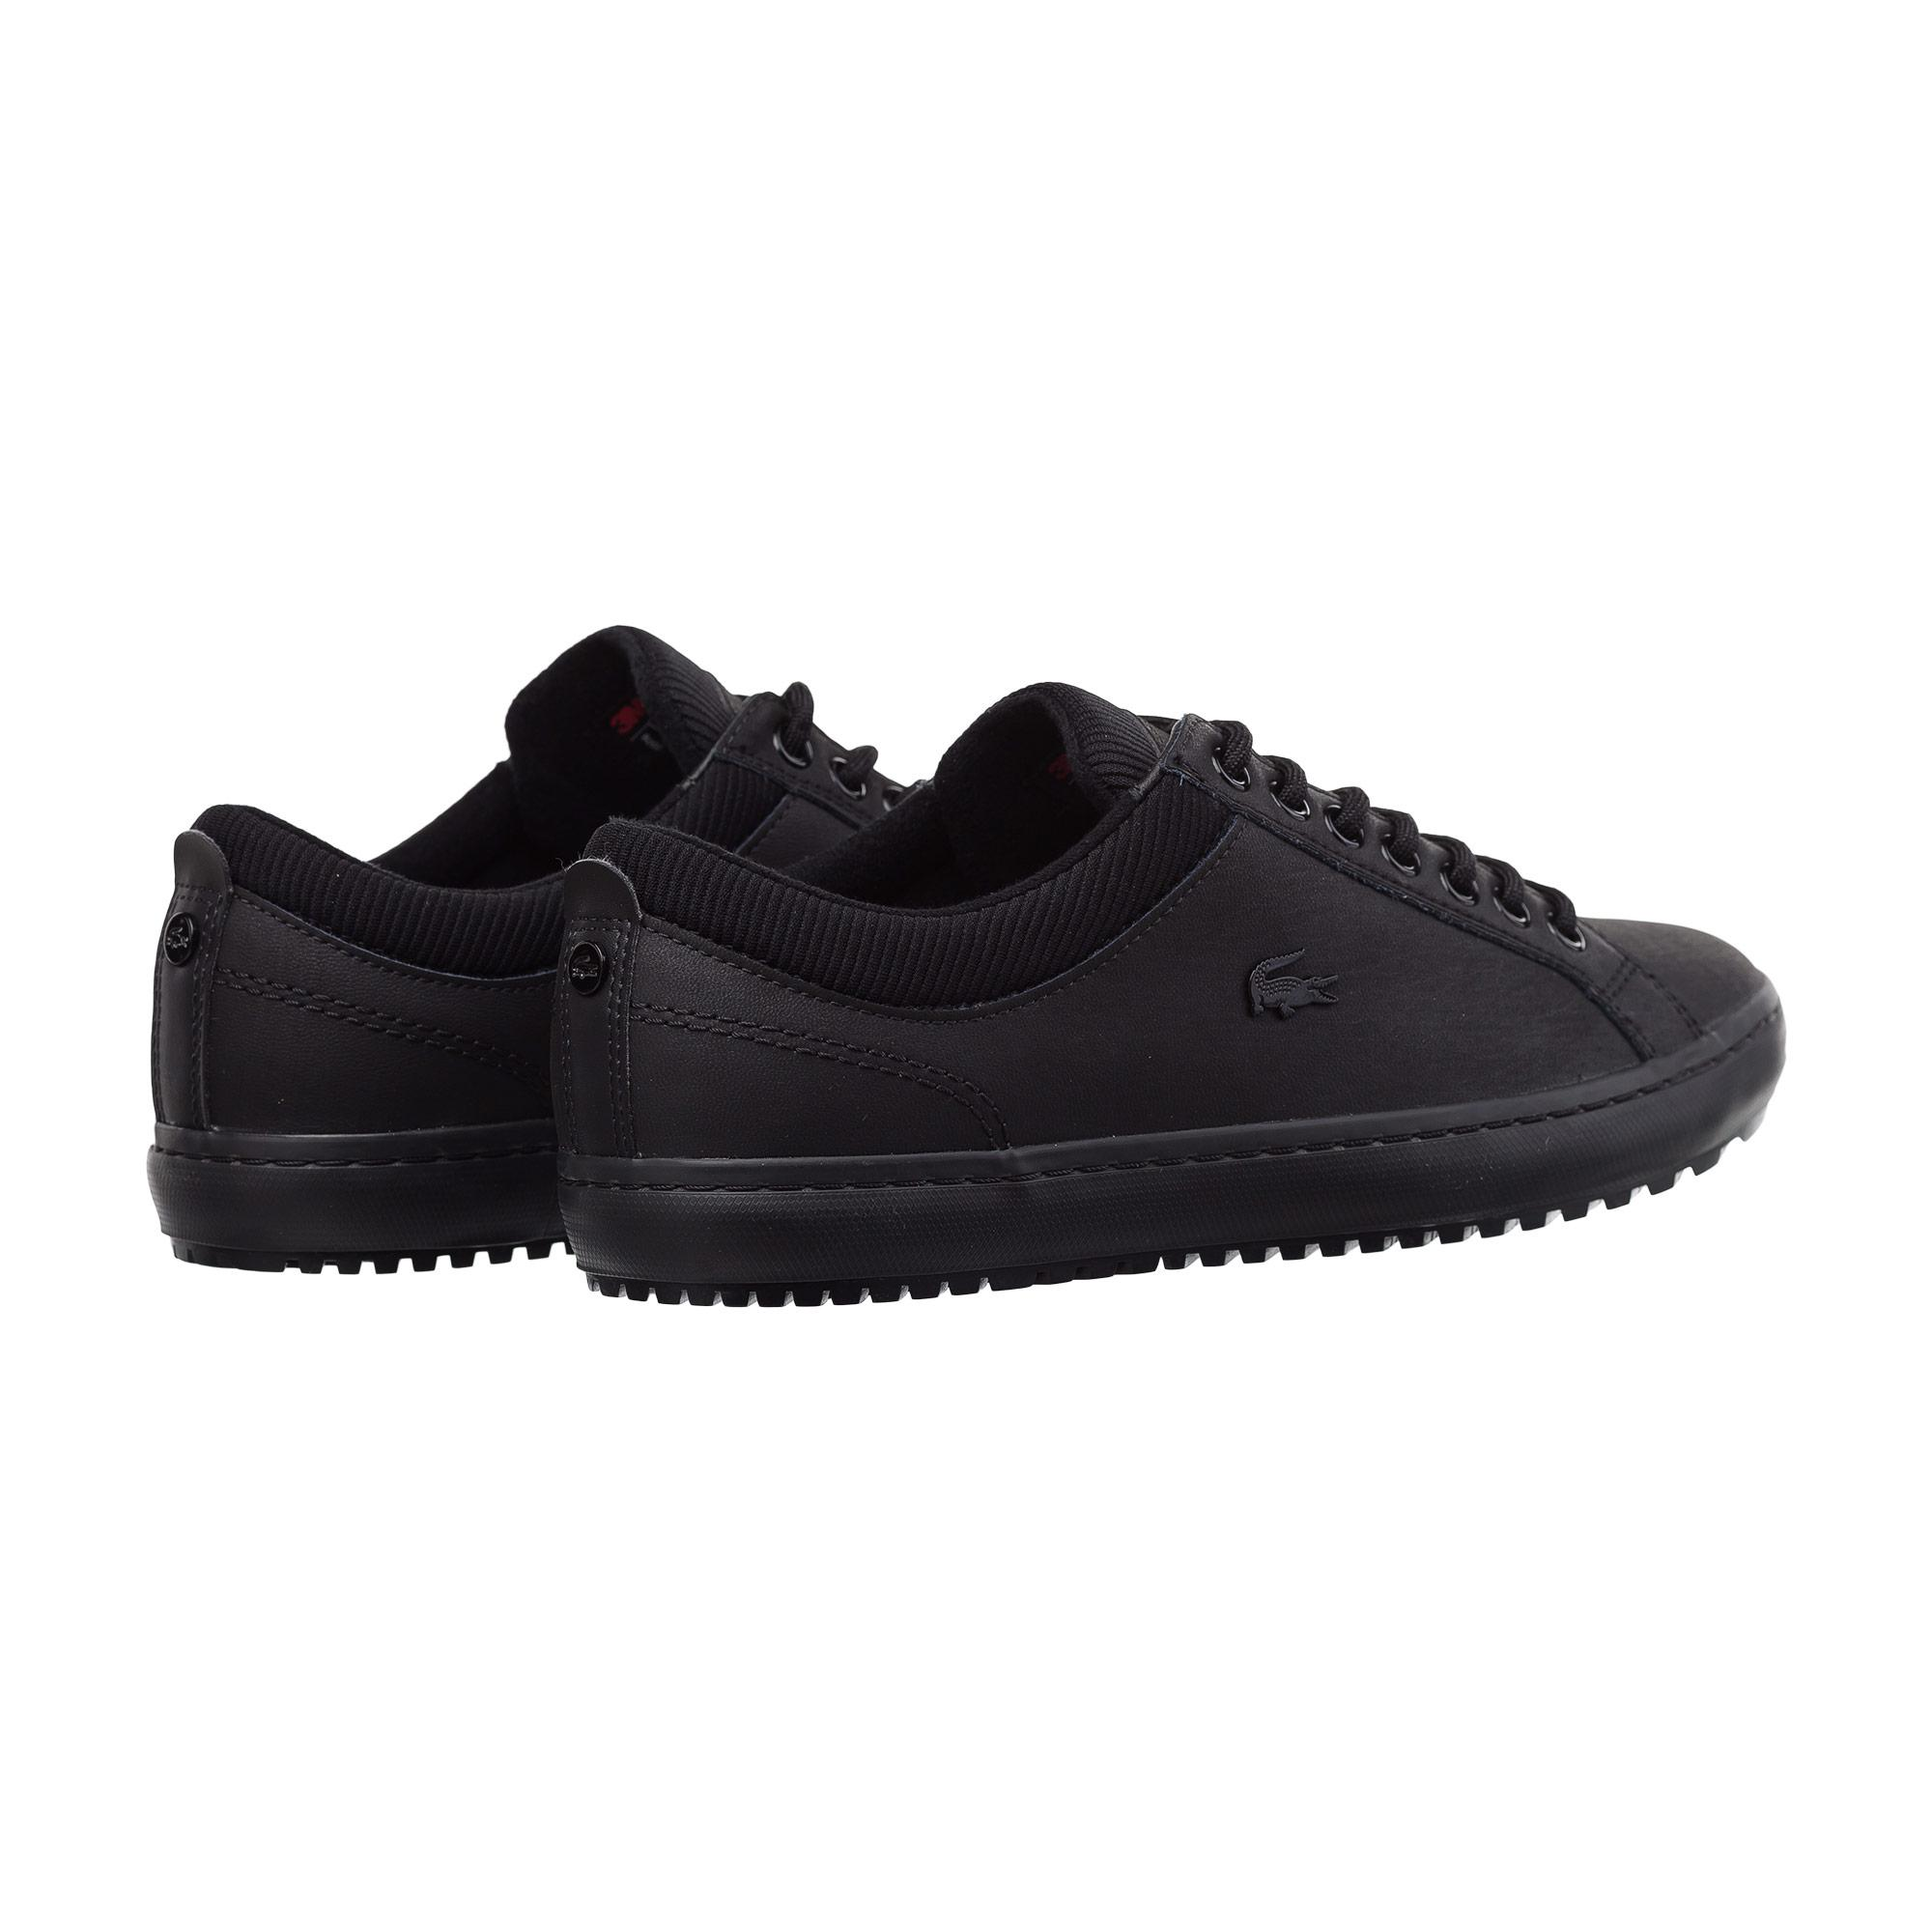 Lacoste Męskie Straightset Insulate 318 1 Sneaker